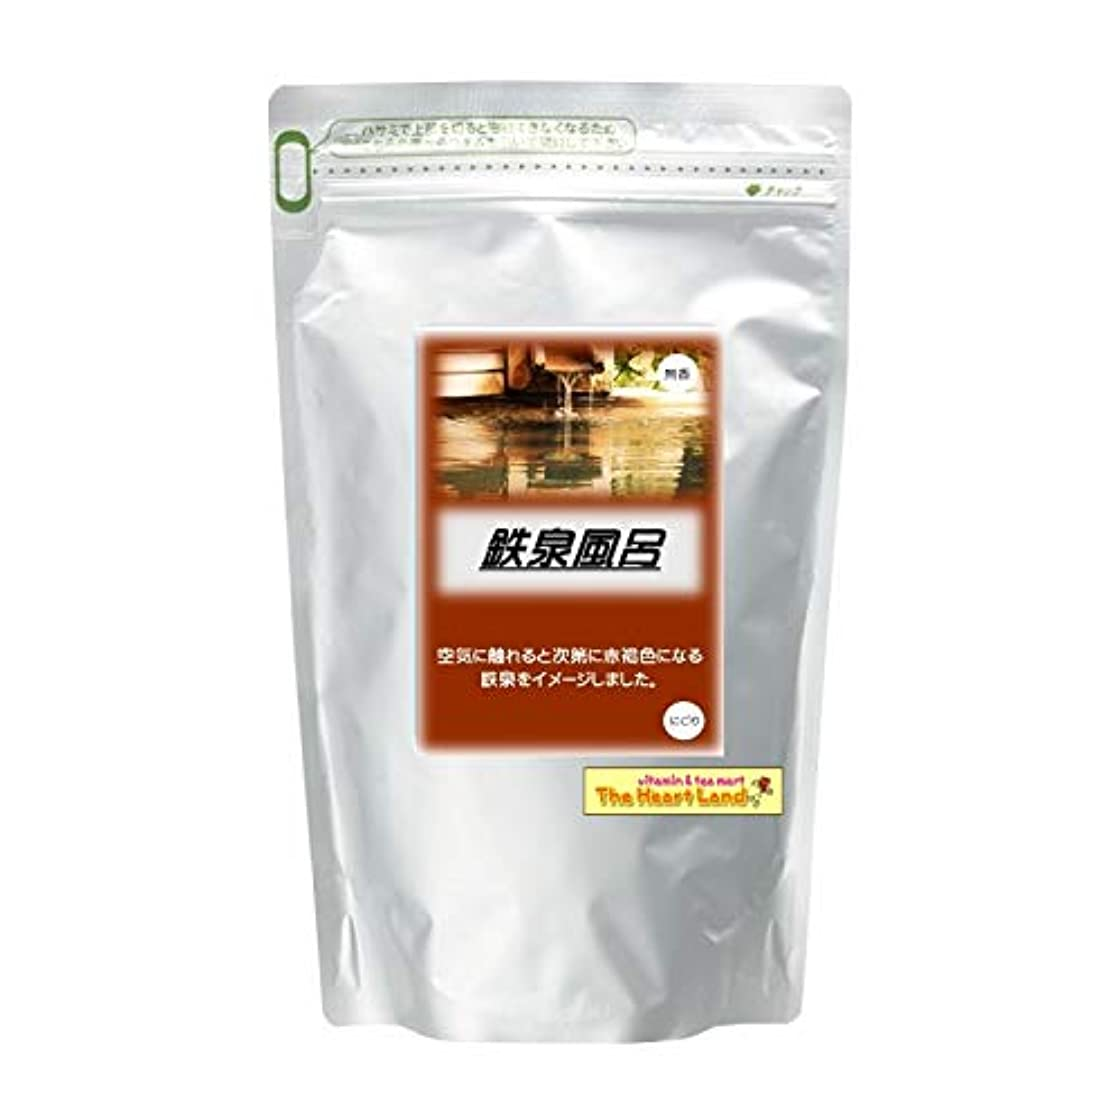 反論閃光スプレーアサヒ入浴剤 浴用入浴化粧品 鉄泉風呂 2.5kg